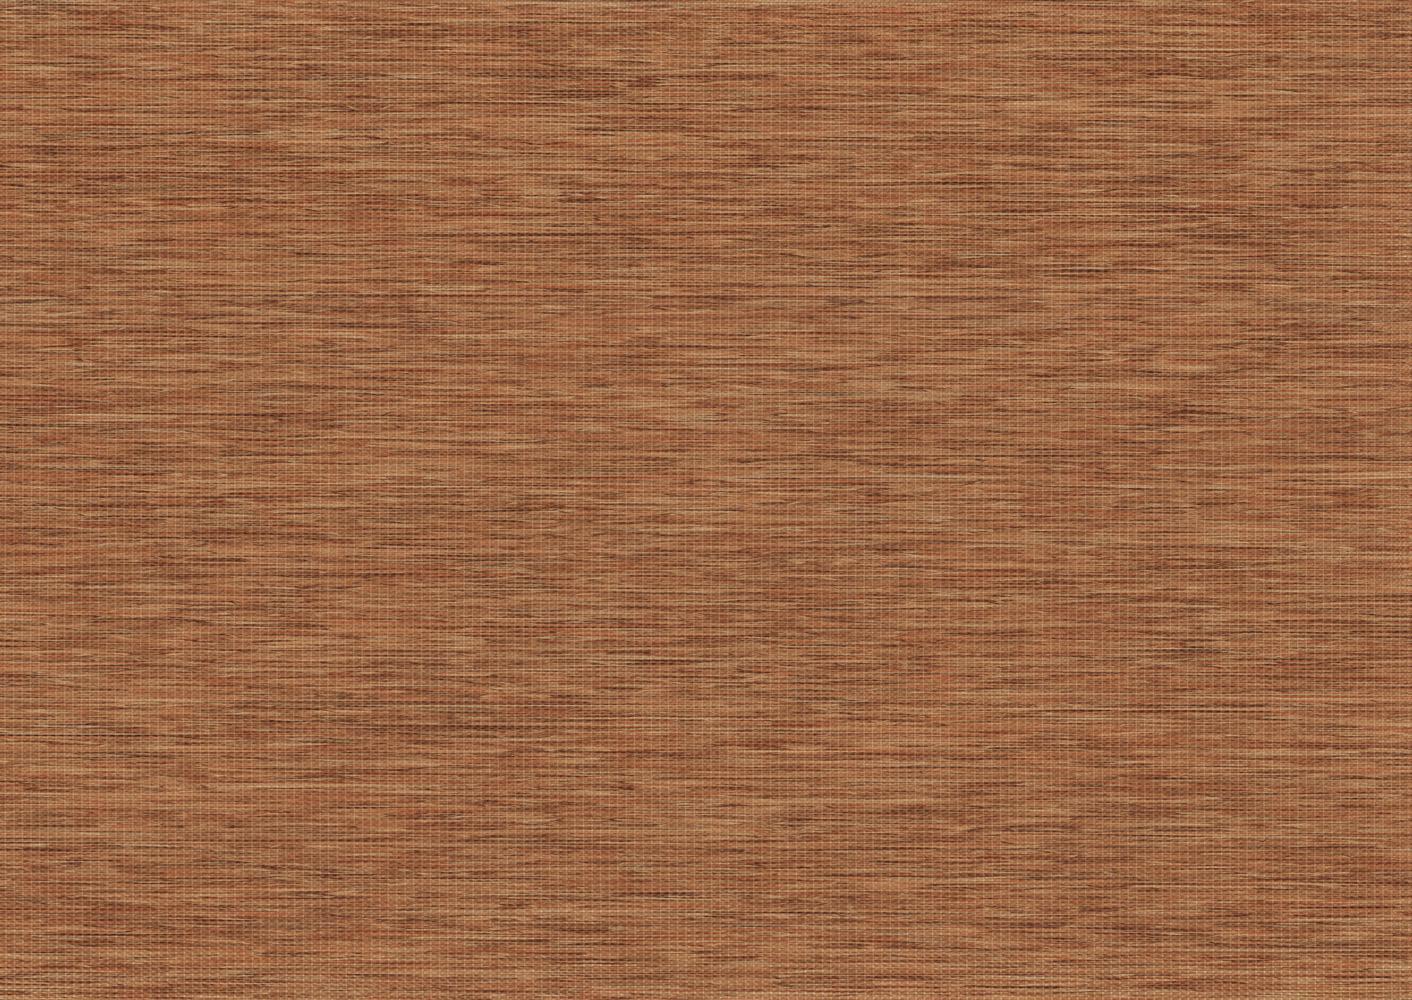 Аруба-коричневый